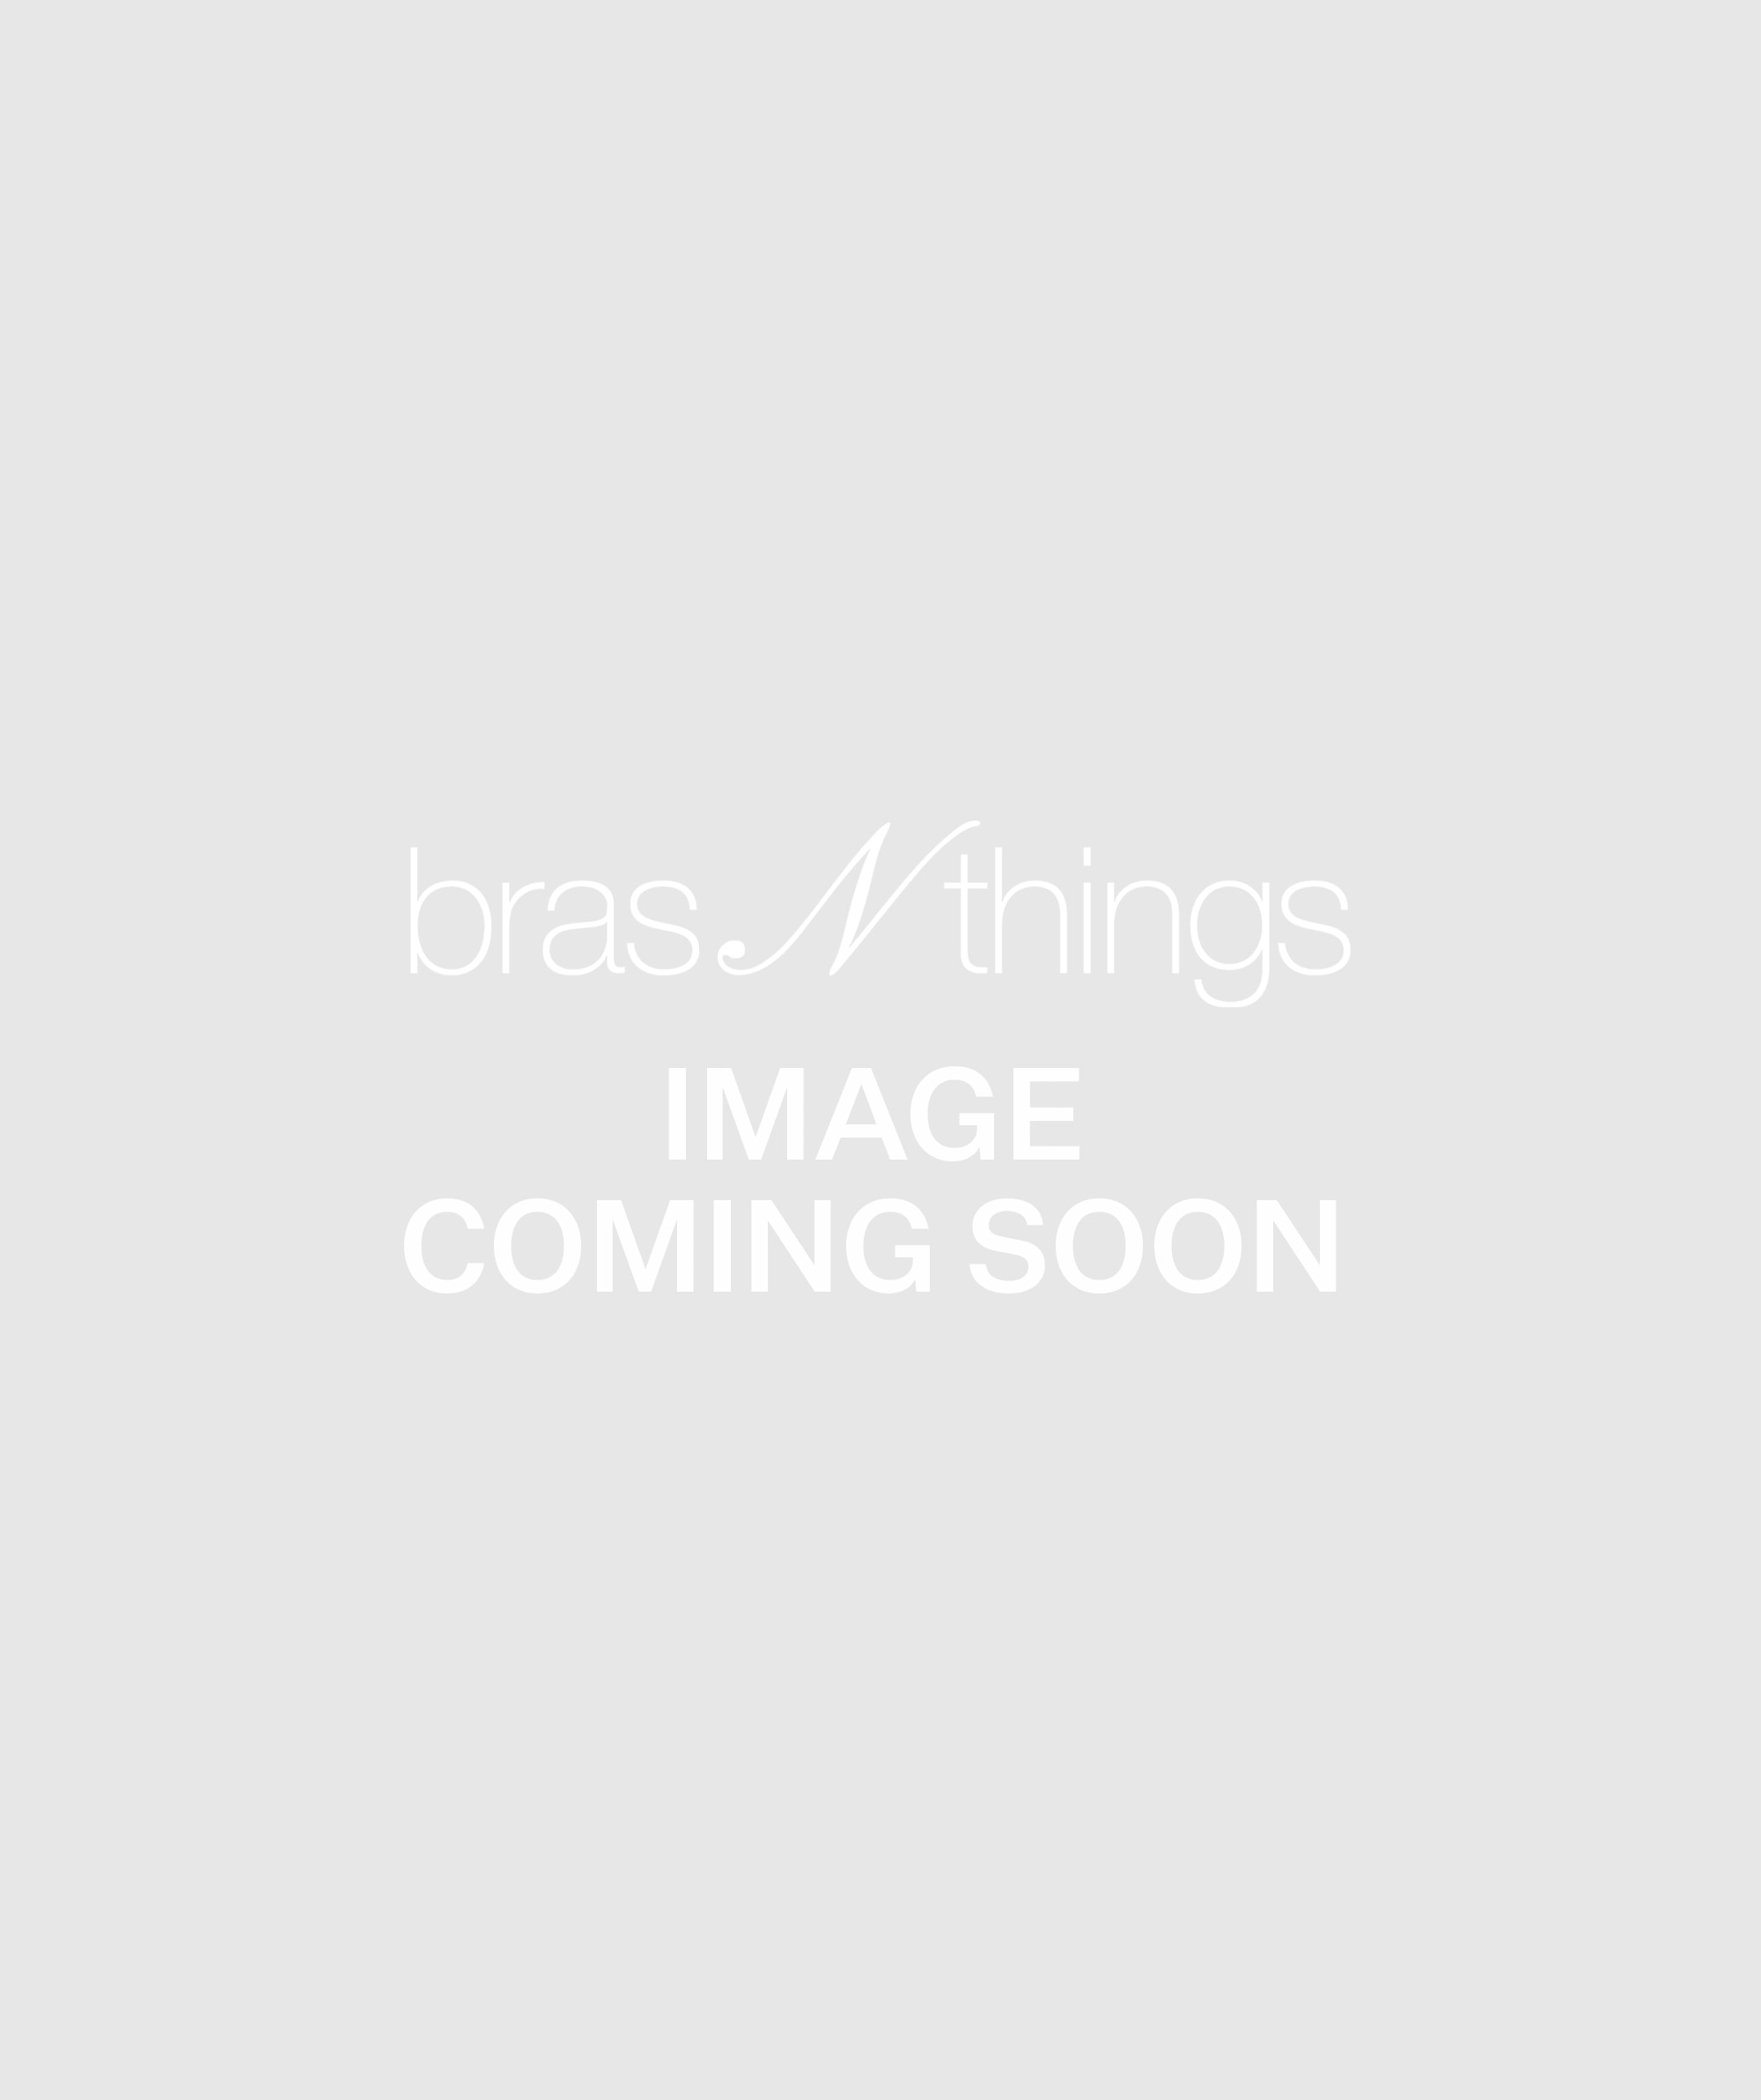 Fiore V String Knicker - Ivory